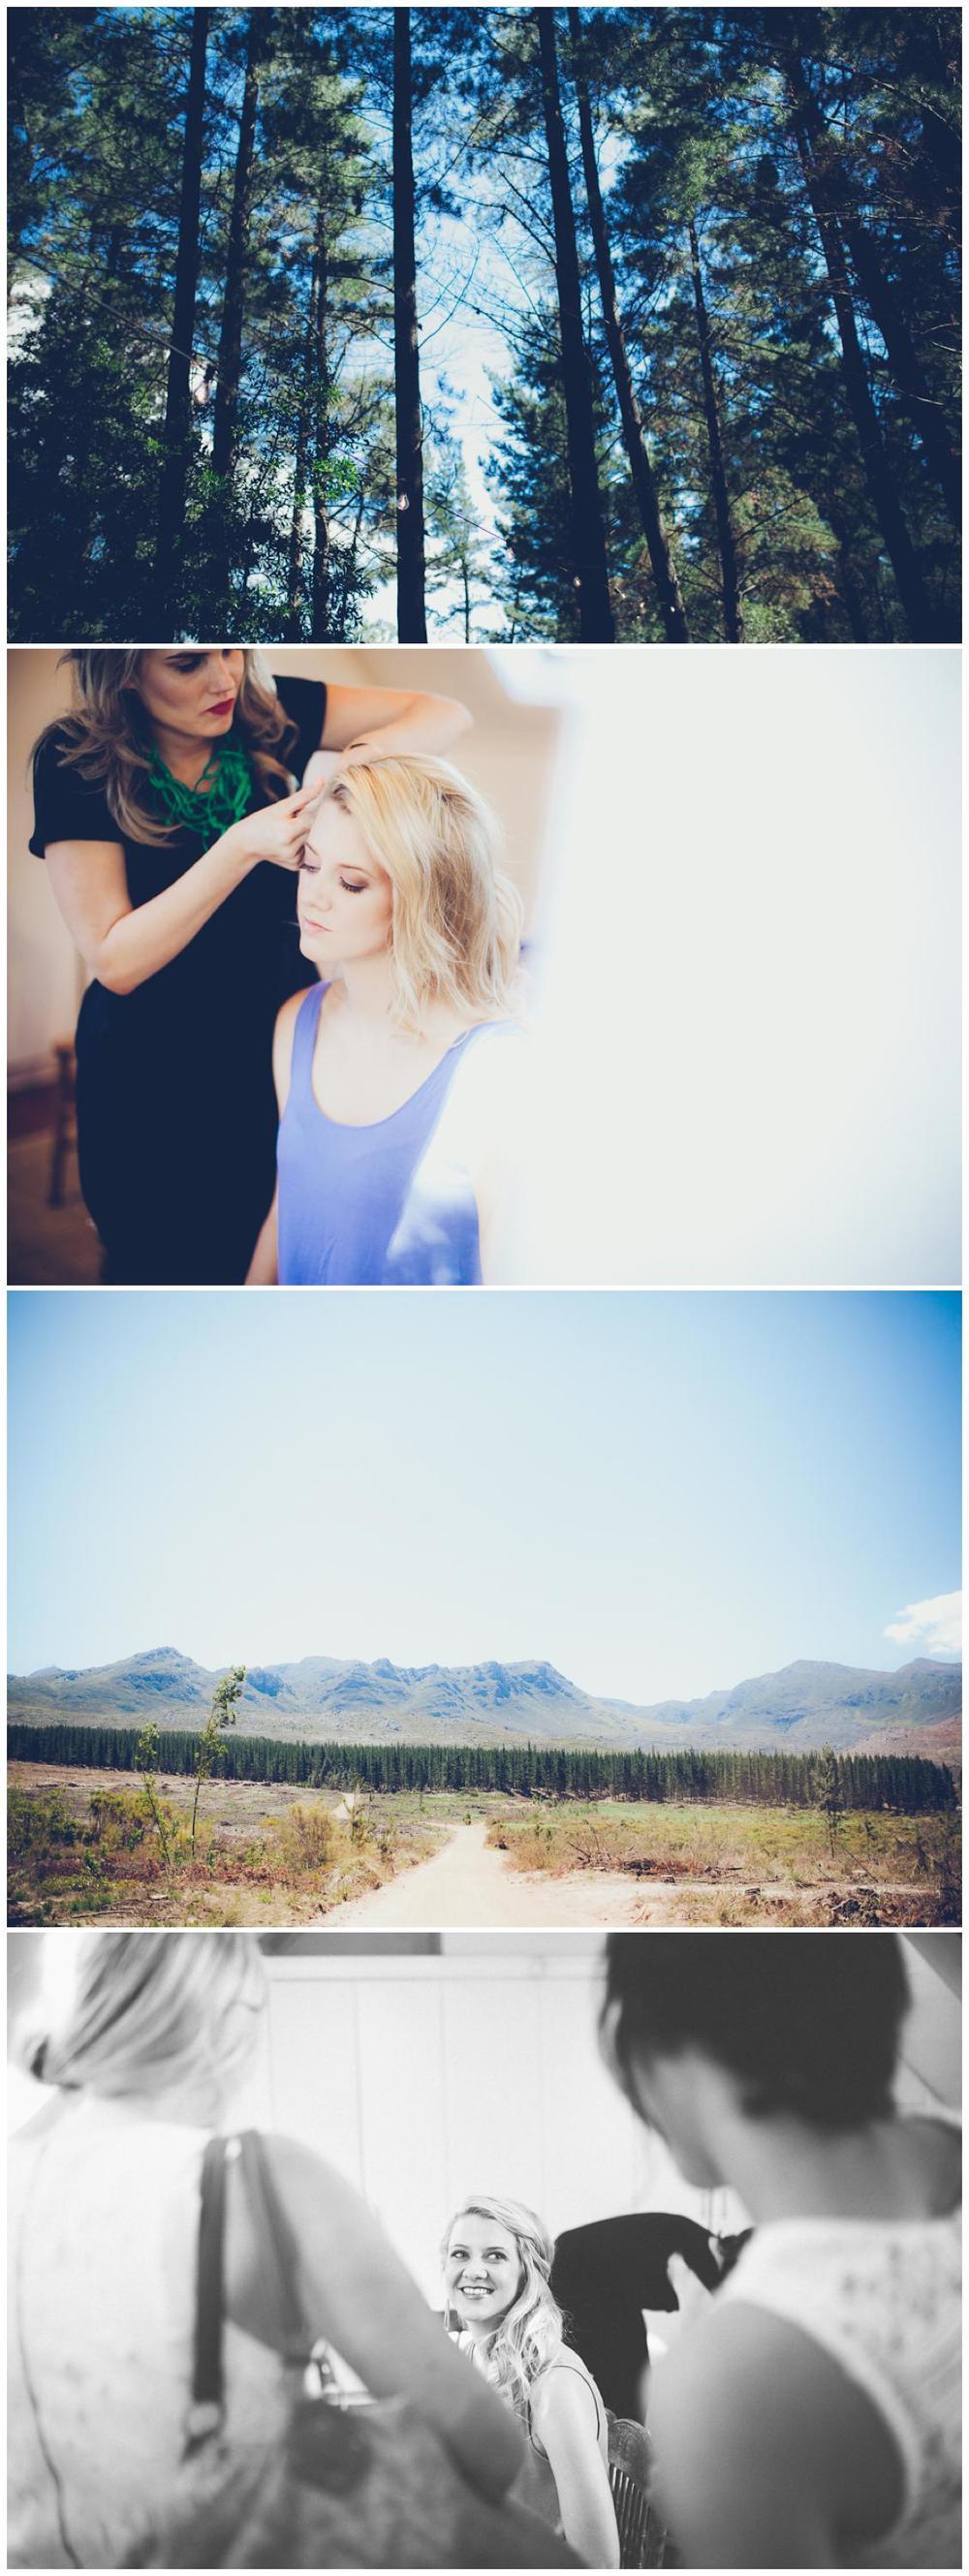 Wessel&Clarissa_FionaClairPhotography-10.jpg